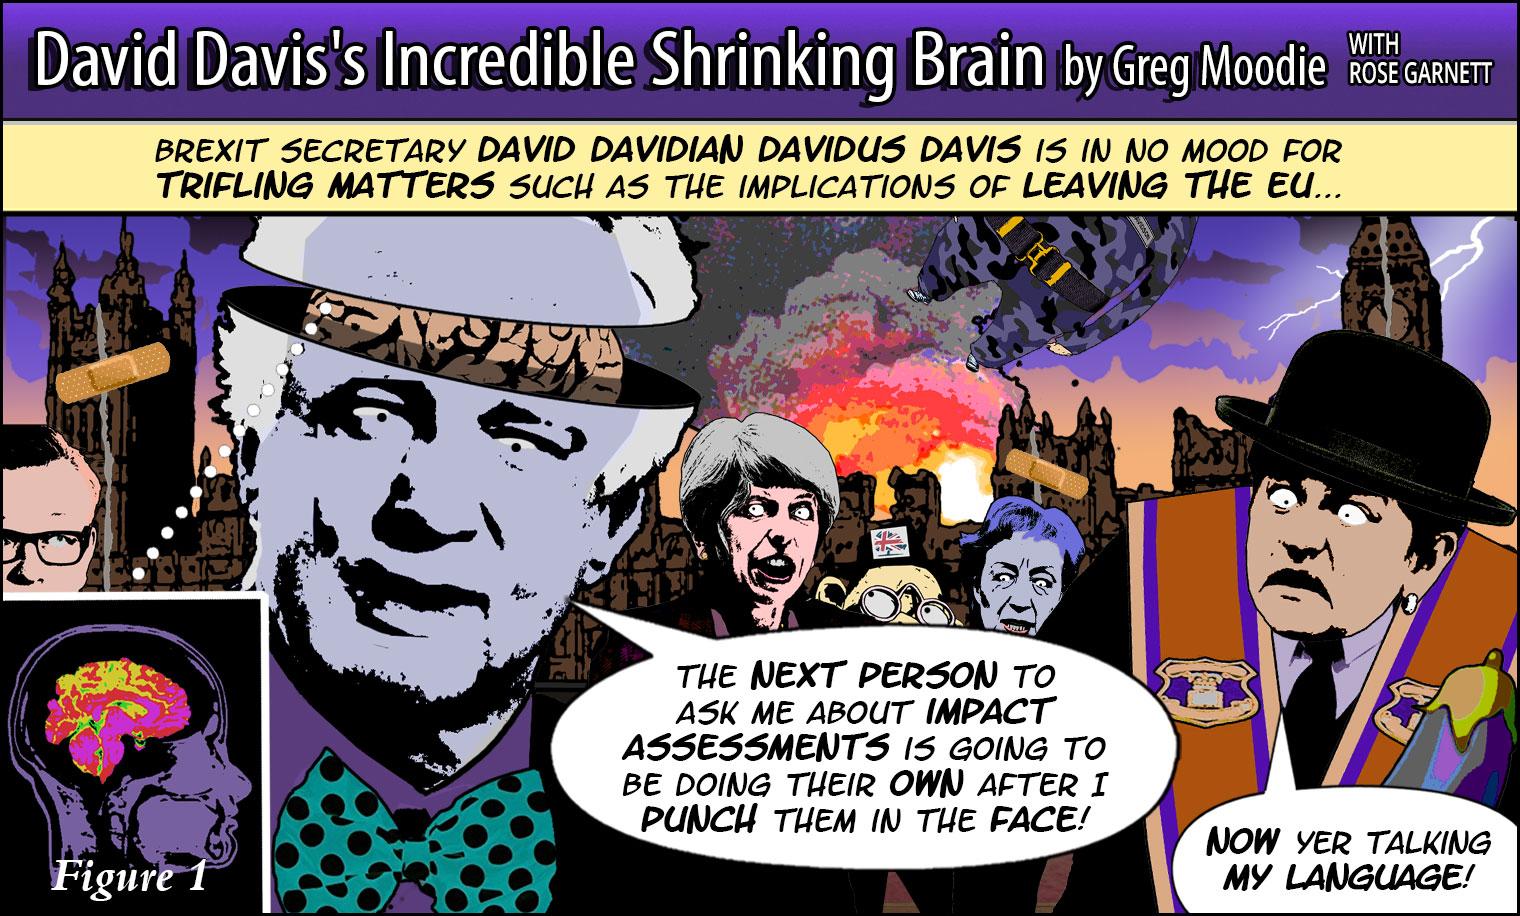 David Davis's Incredible Shrinking Brain